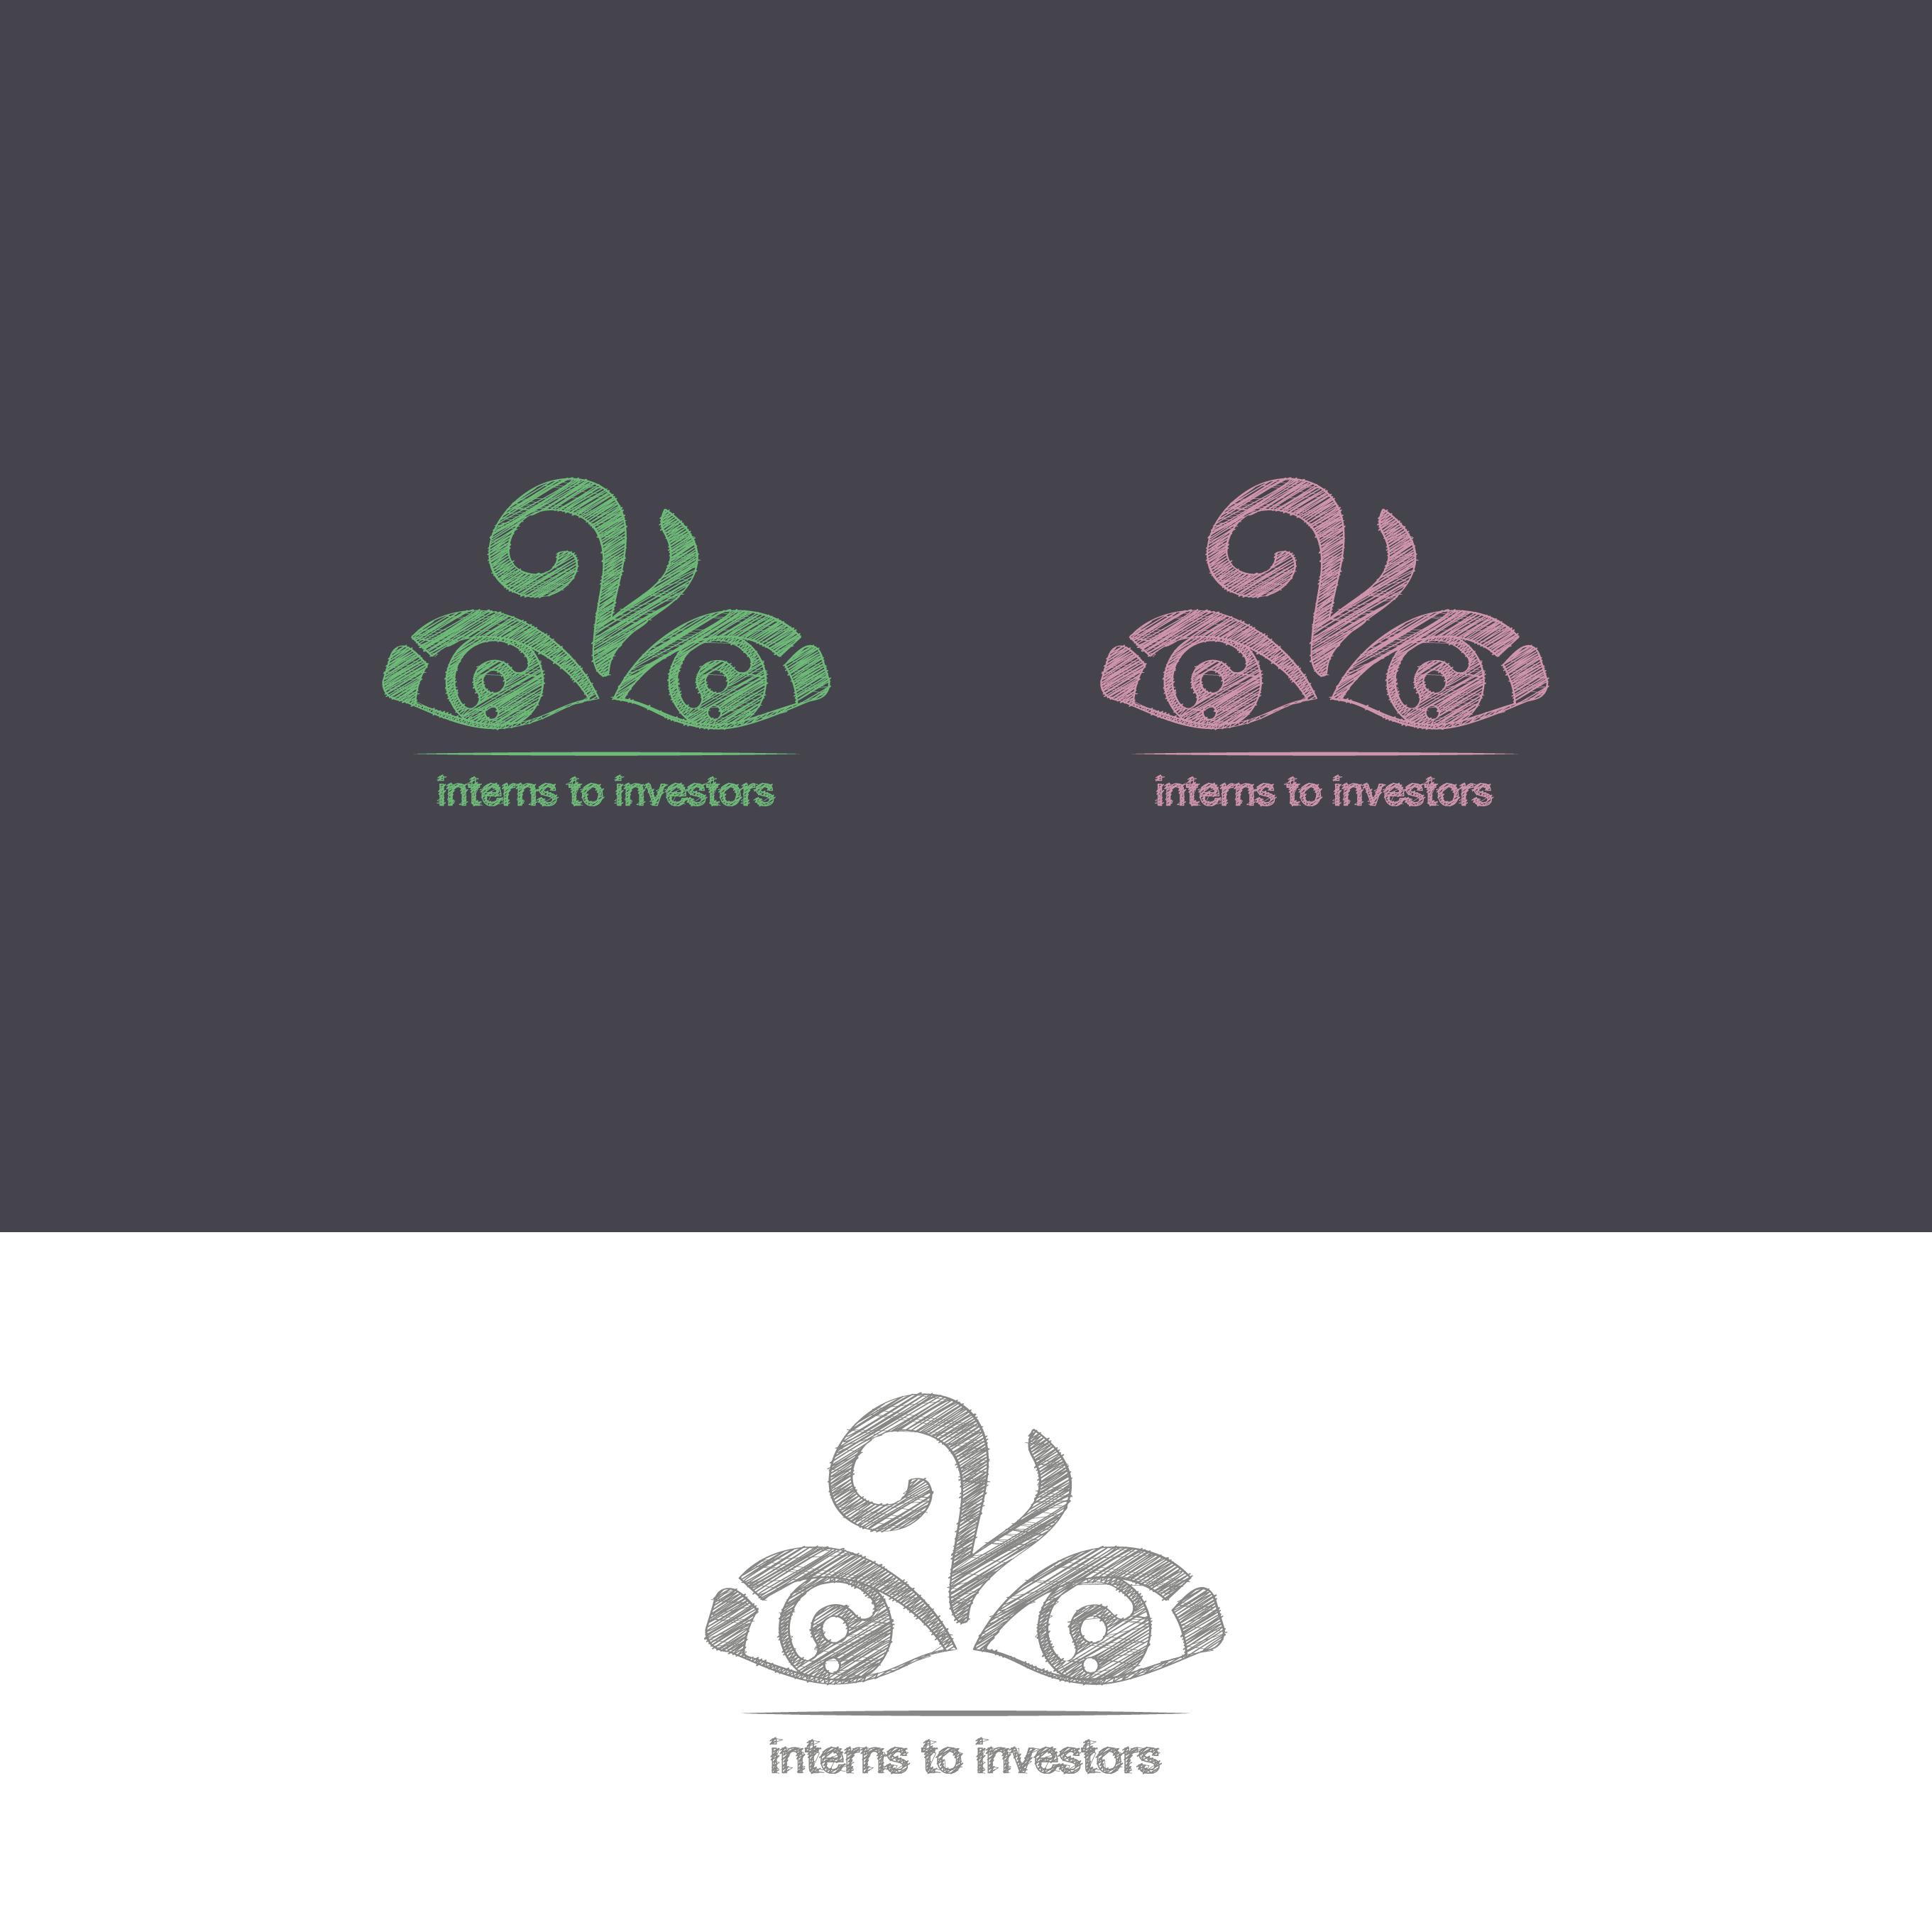 Create a logo for i2I - interns to Investors